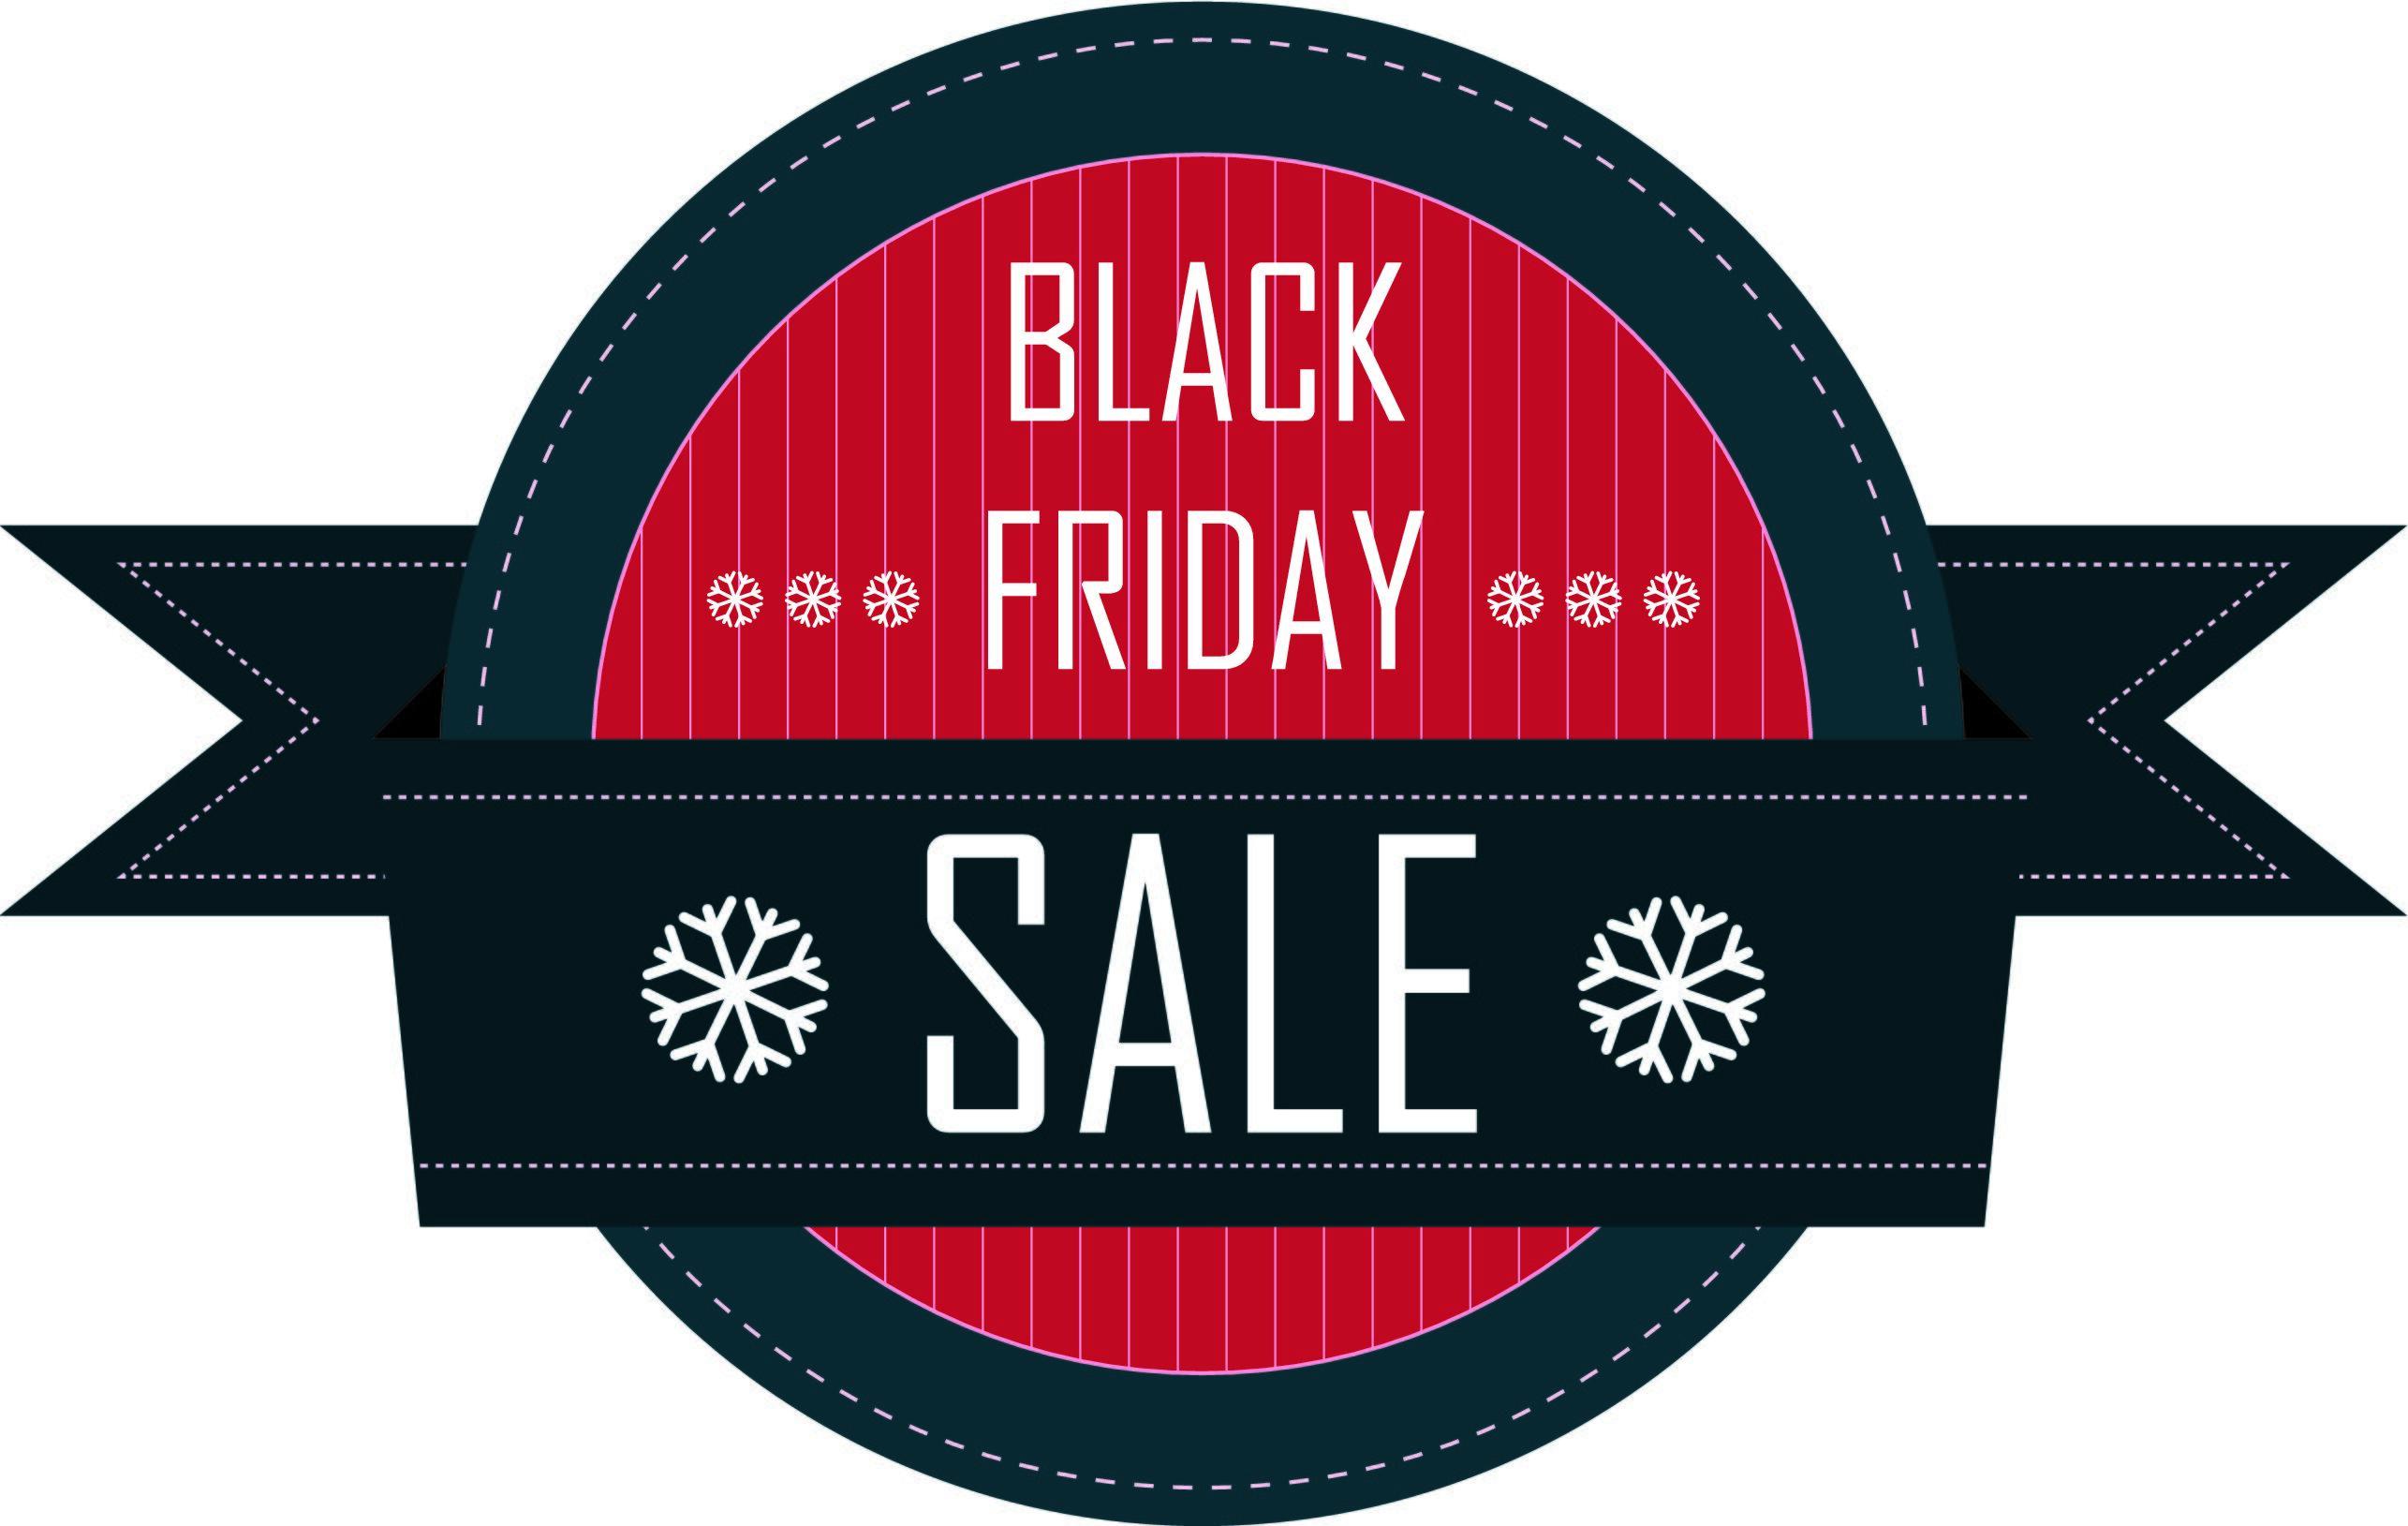 Black Friday Used Car Sales 2018